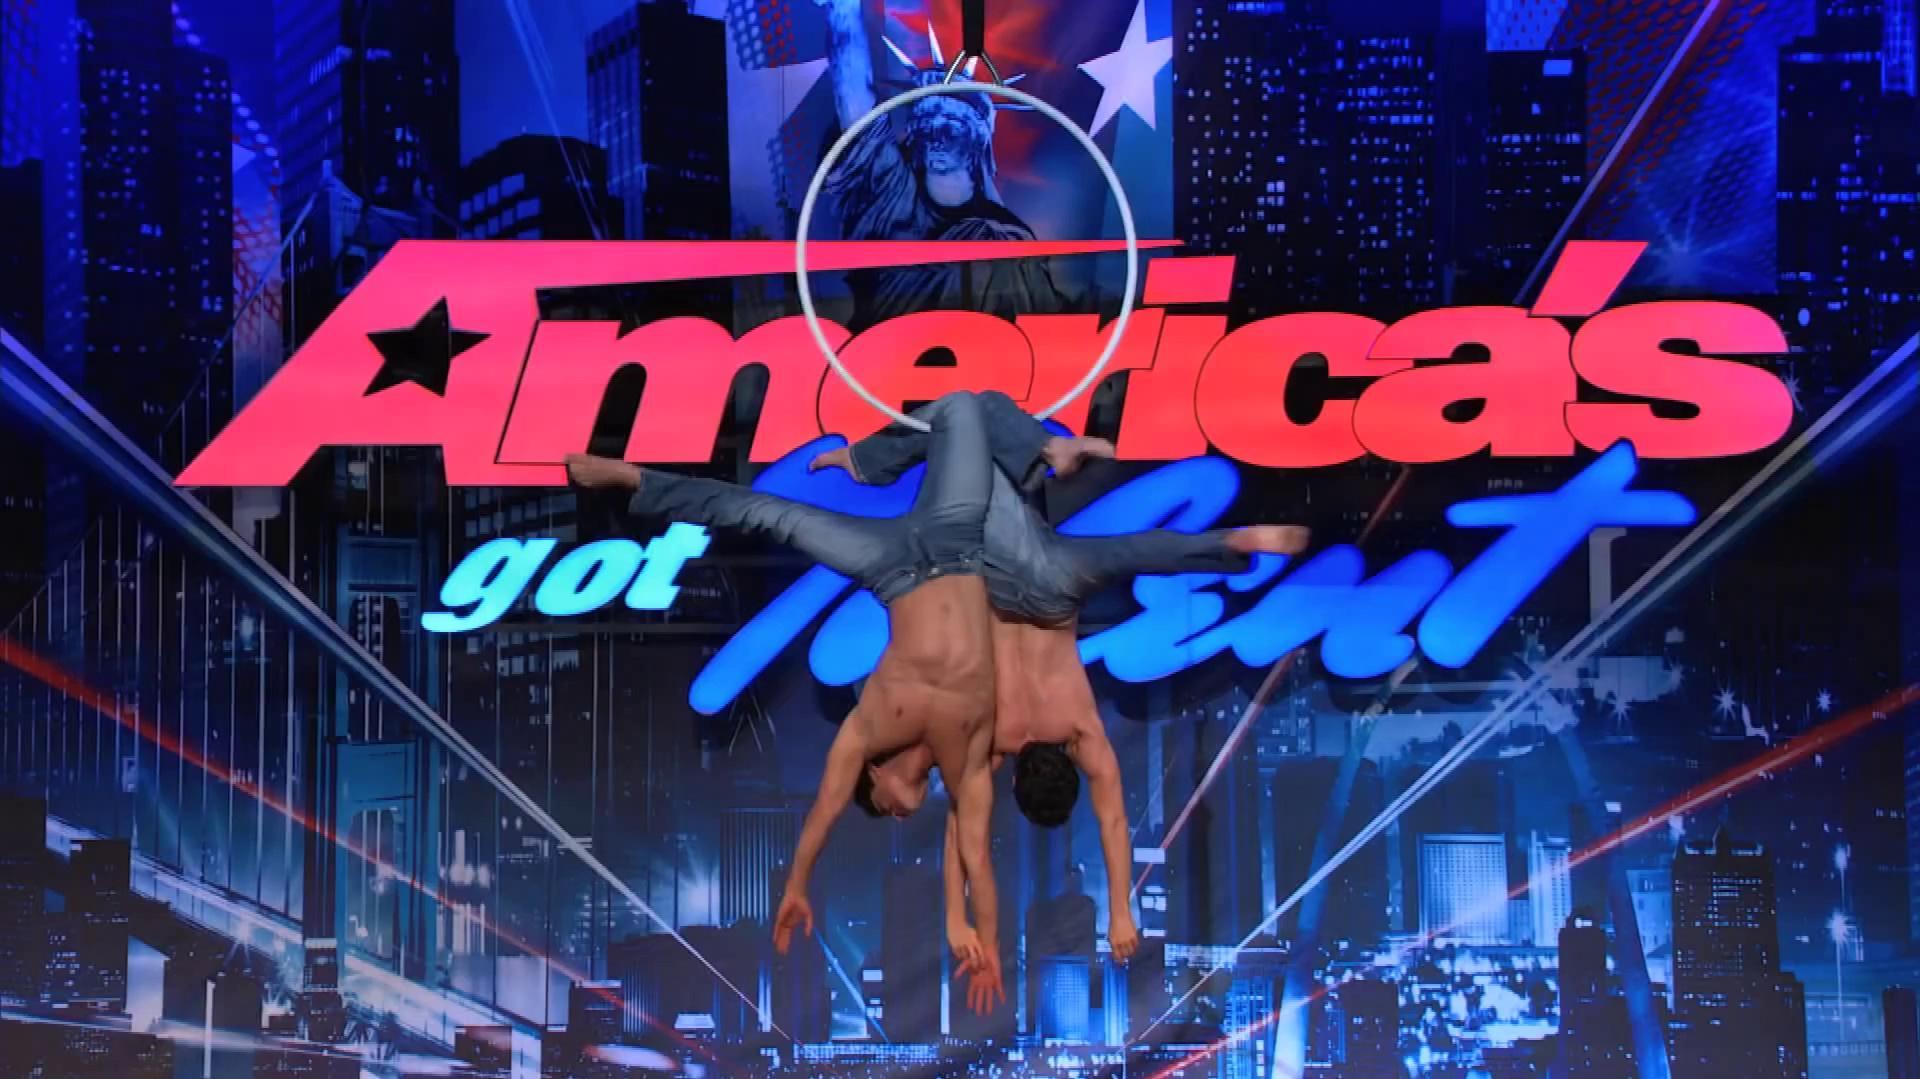 America's Got Talent 2013 - Season 8 - 095 - Tavi & Antonio - Acrobatic Duet Gets Howard and Howie to Kiss